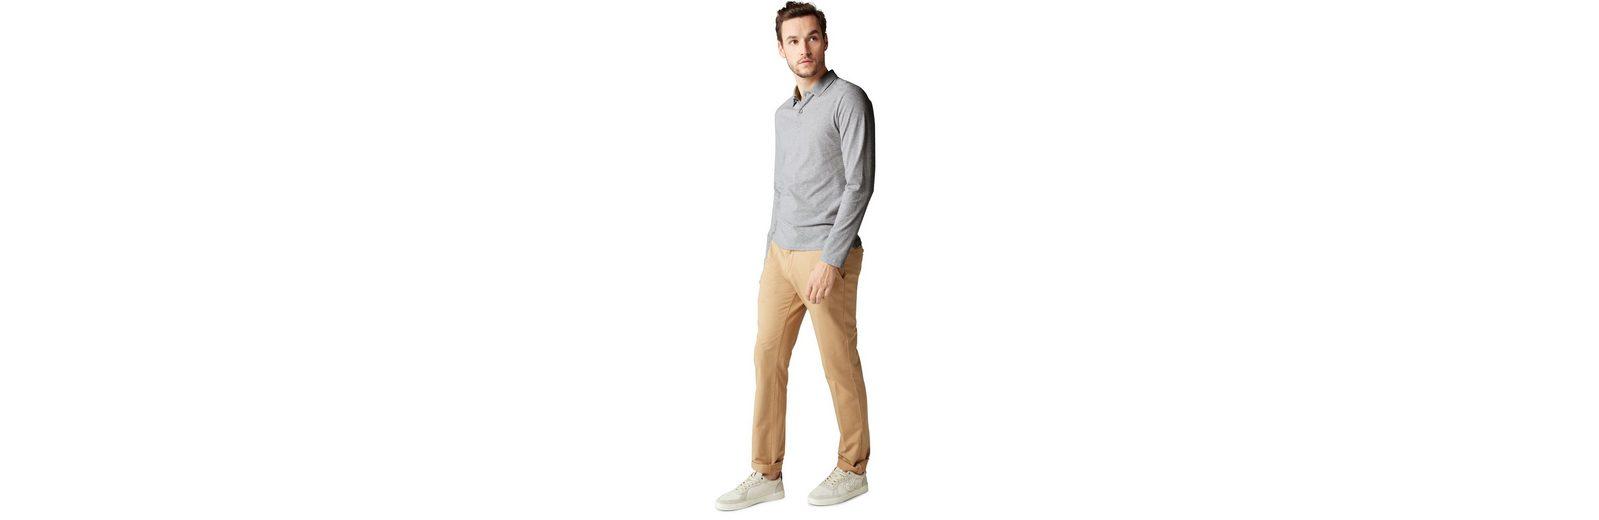 Marc O'Polo Langarm-Poloshirt Steckdose Billig Authentisch bNXuCHE